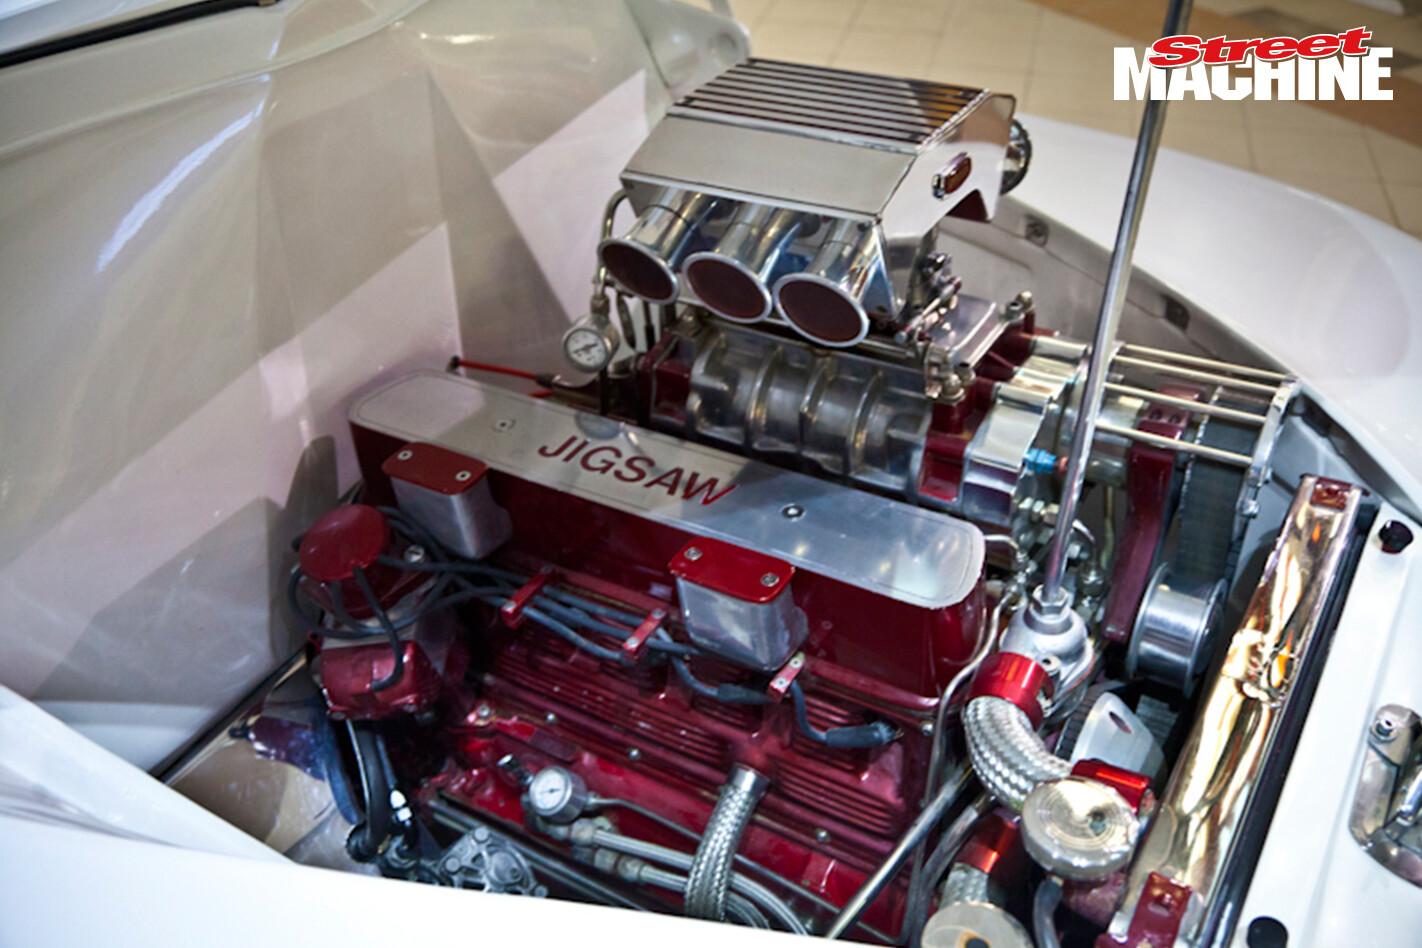 FJ Holden JIGSAW Engine